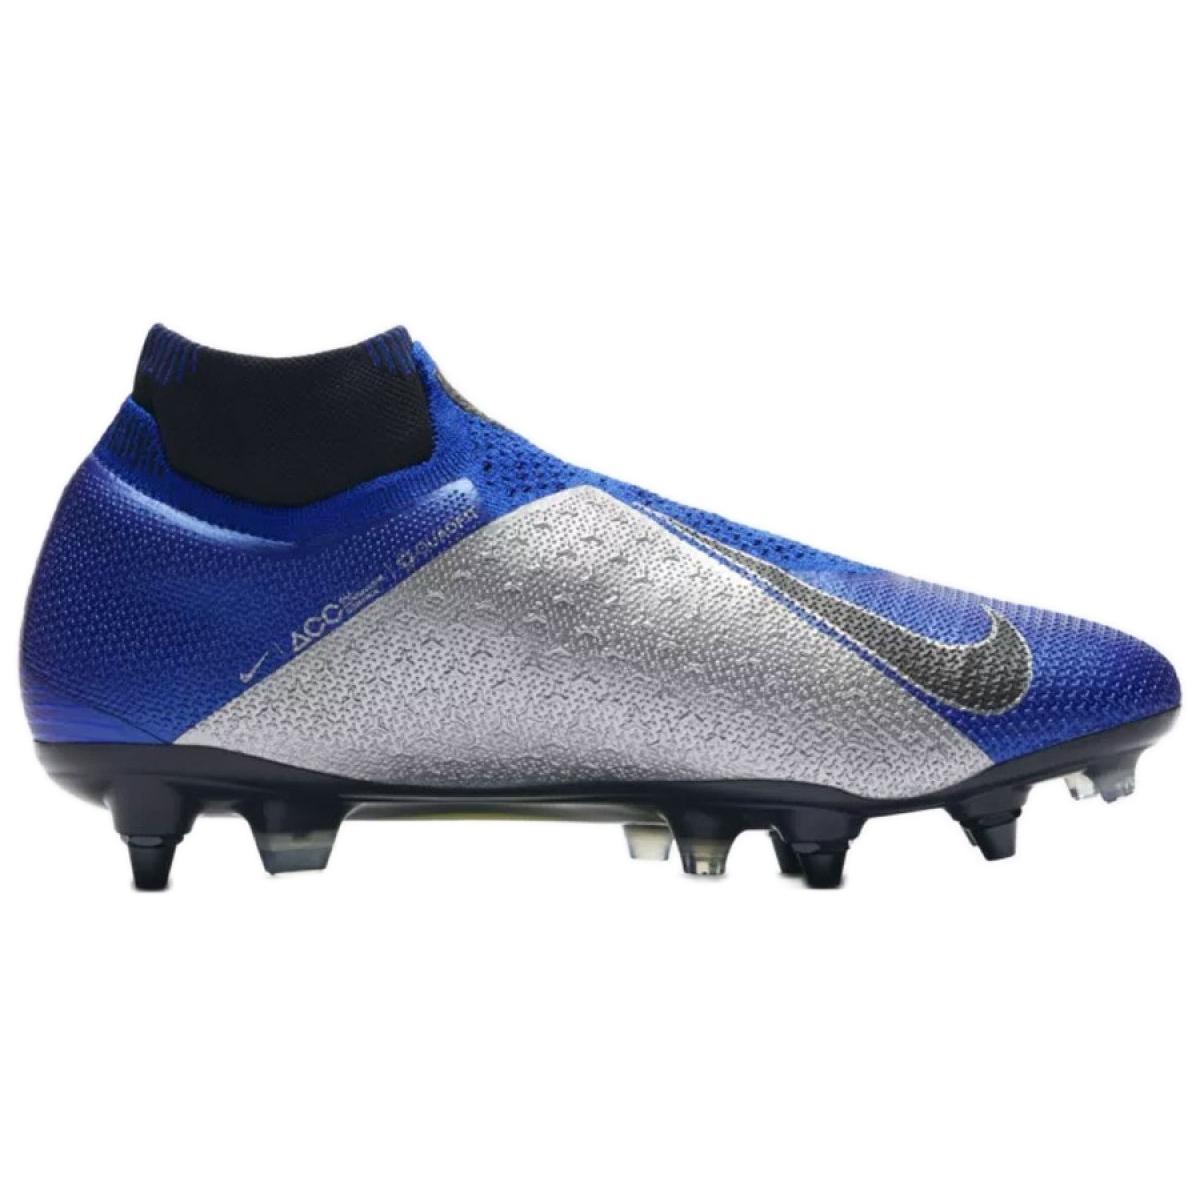 cheaper d765b ca26b The Nike Phantom Vsn Elite Df Sg Pro Ac M AO3264-400 football boots